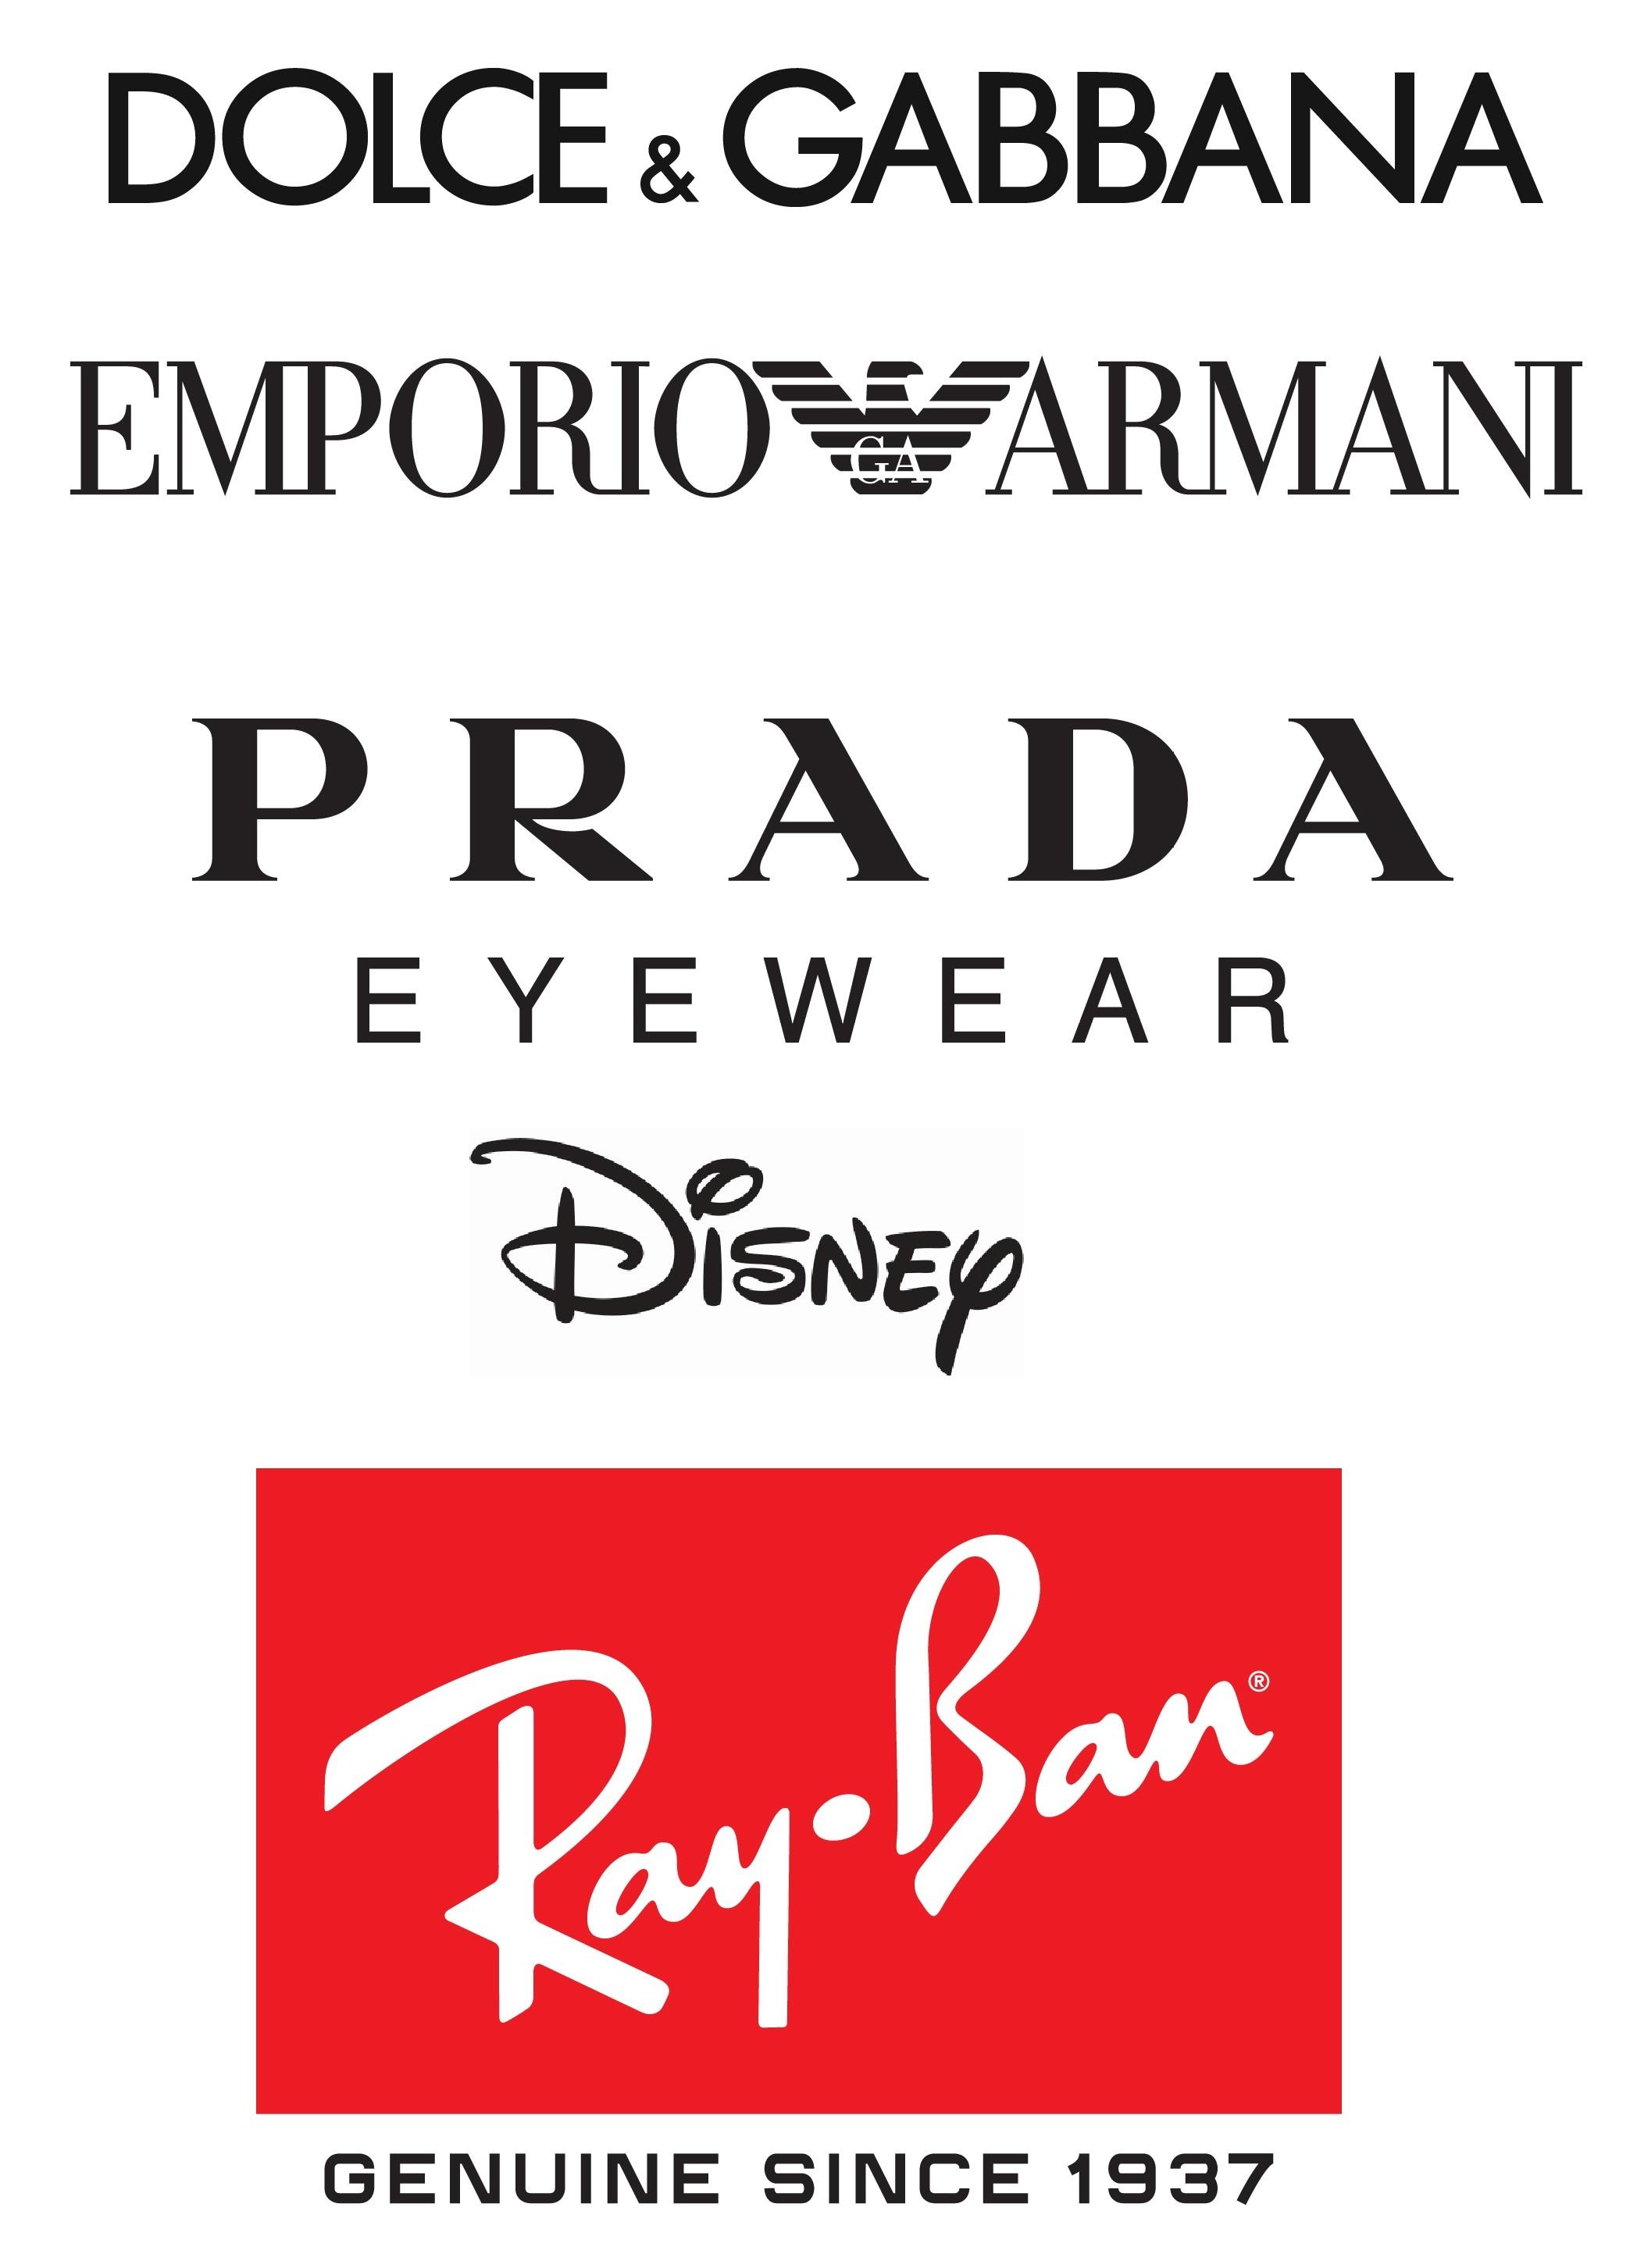 Dolce & Gabbana, Emporio Armani, Prada, Ray Ban